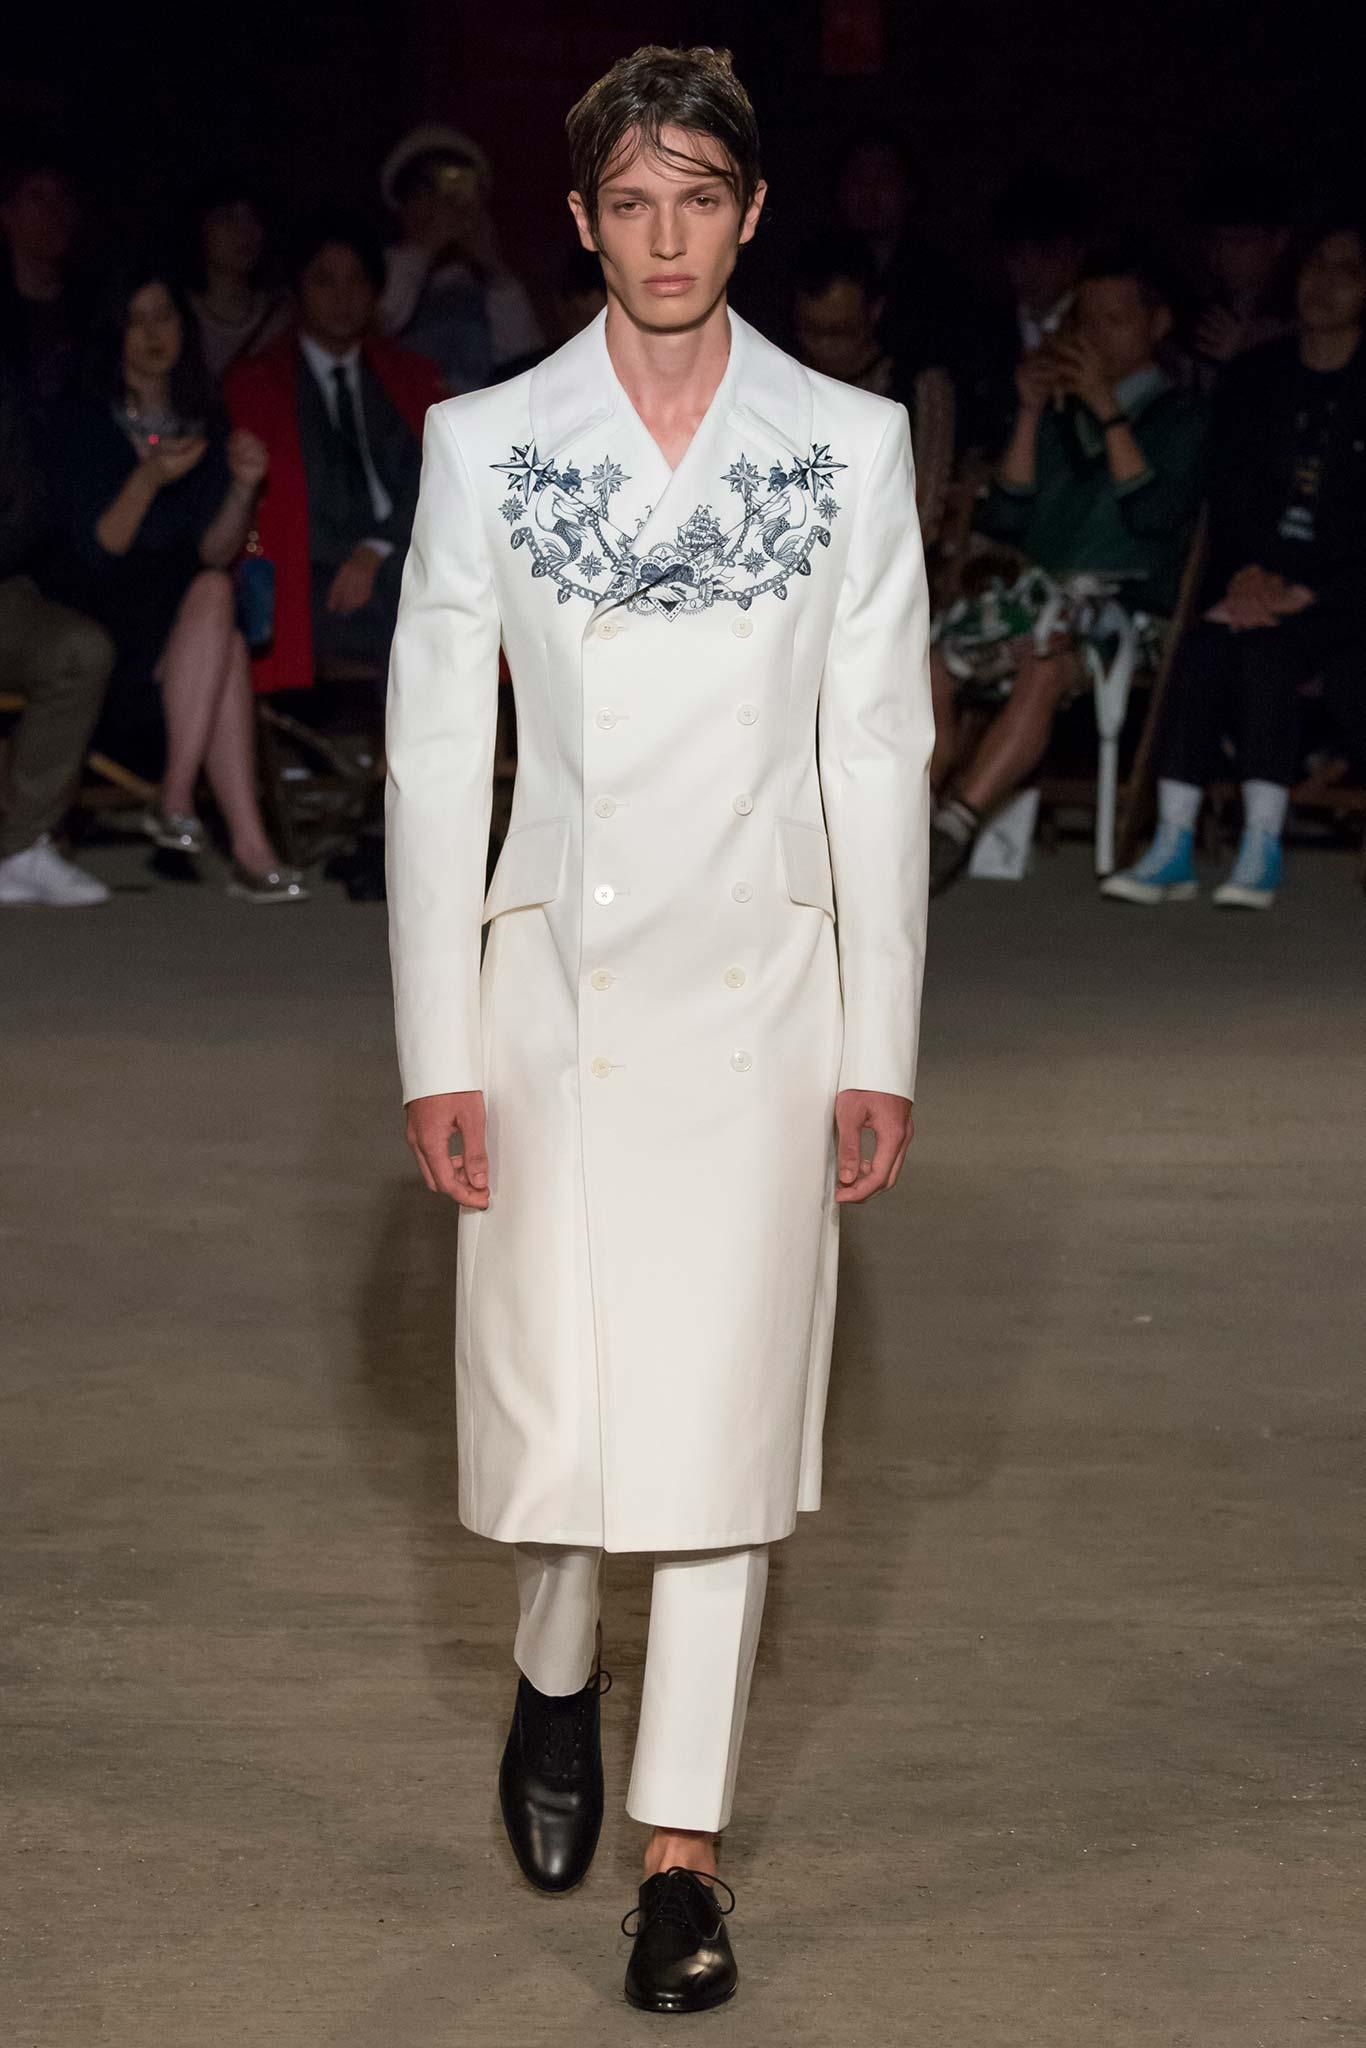 Alexander McQueen Menswear SS 2016 London